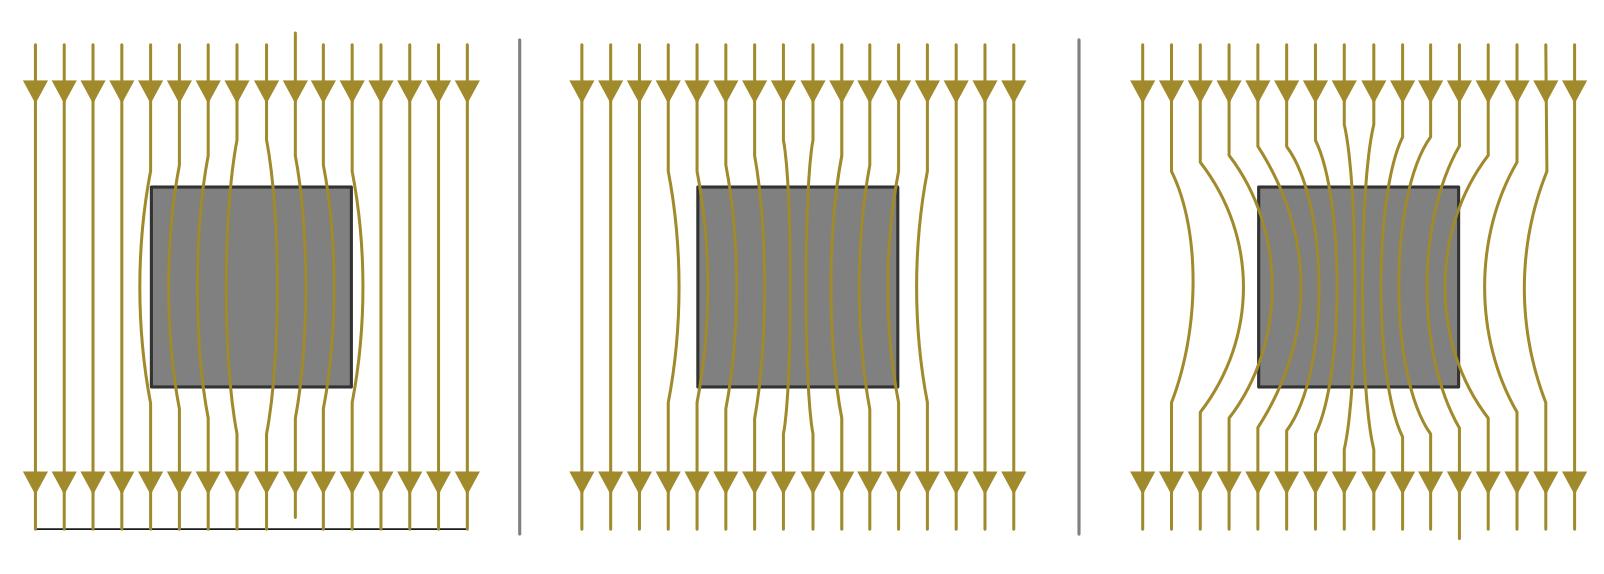 Magnetismus — Grundwissen Physik